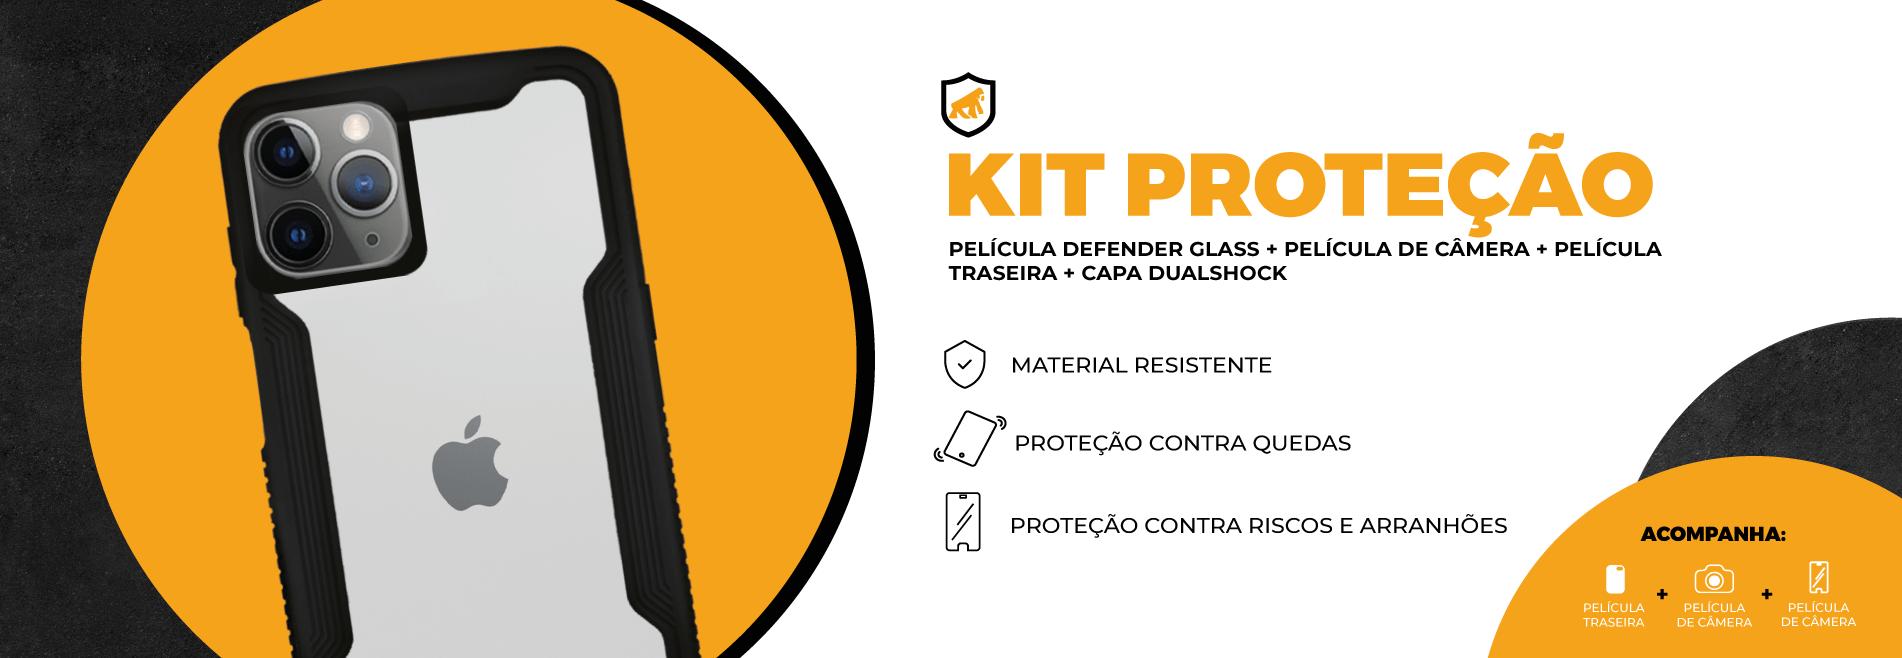 Kit proteção